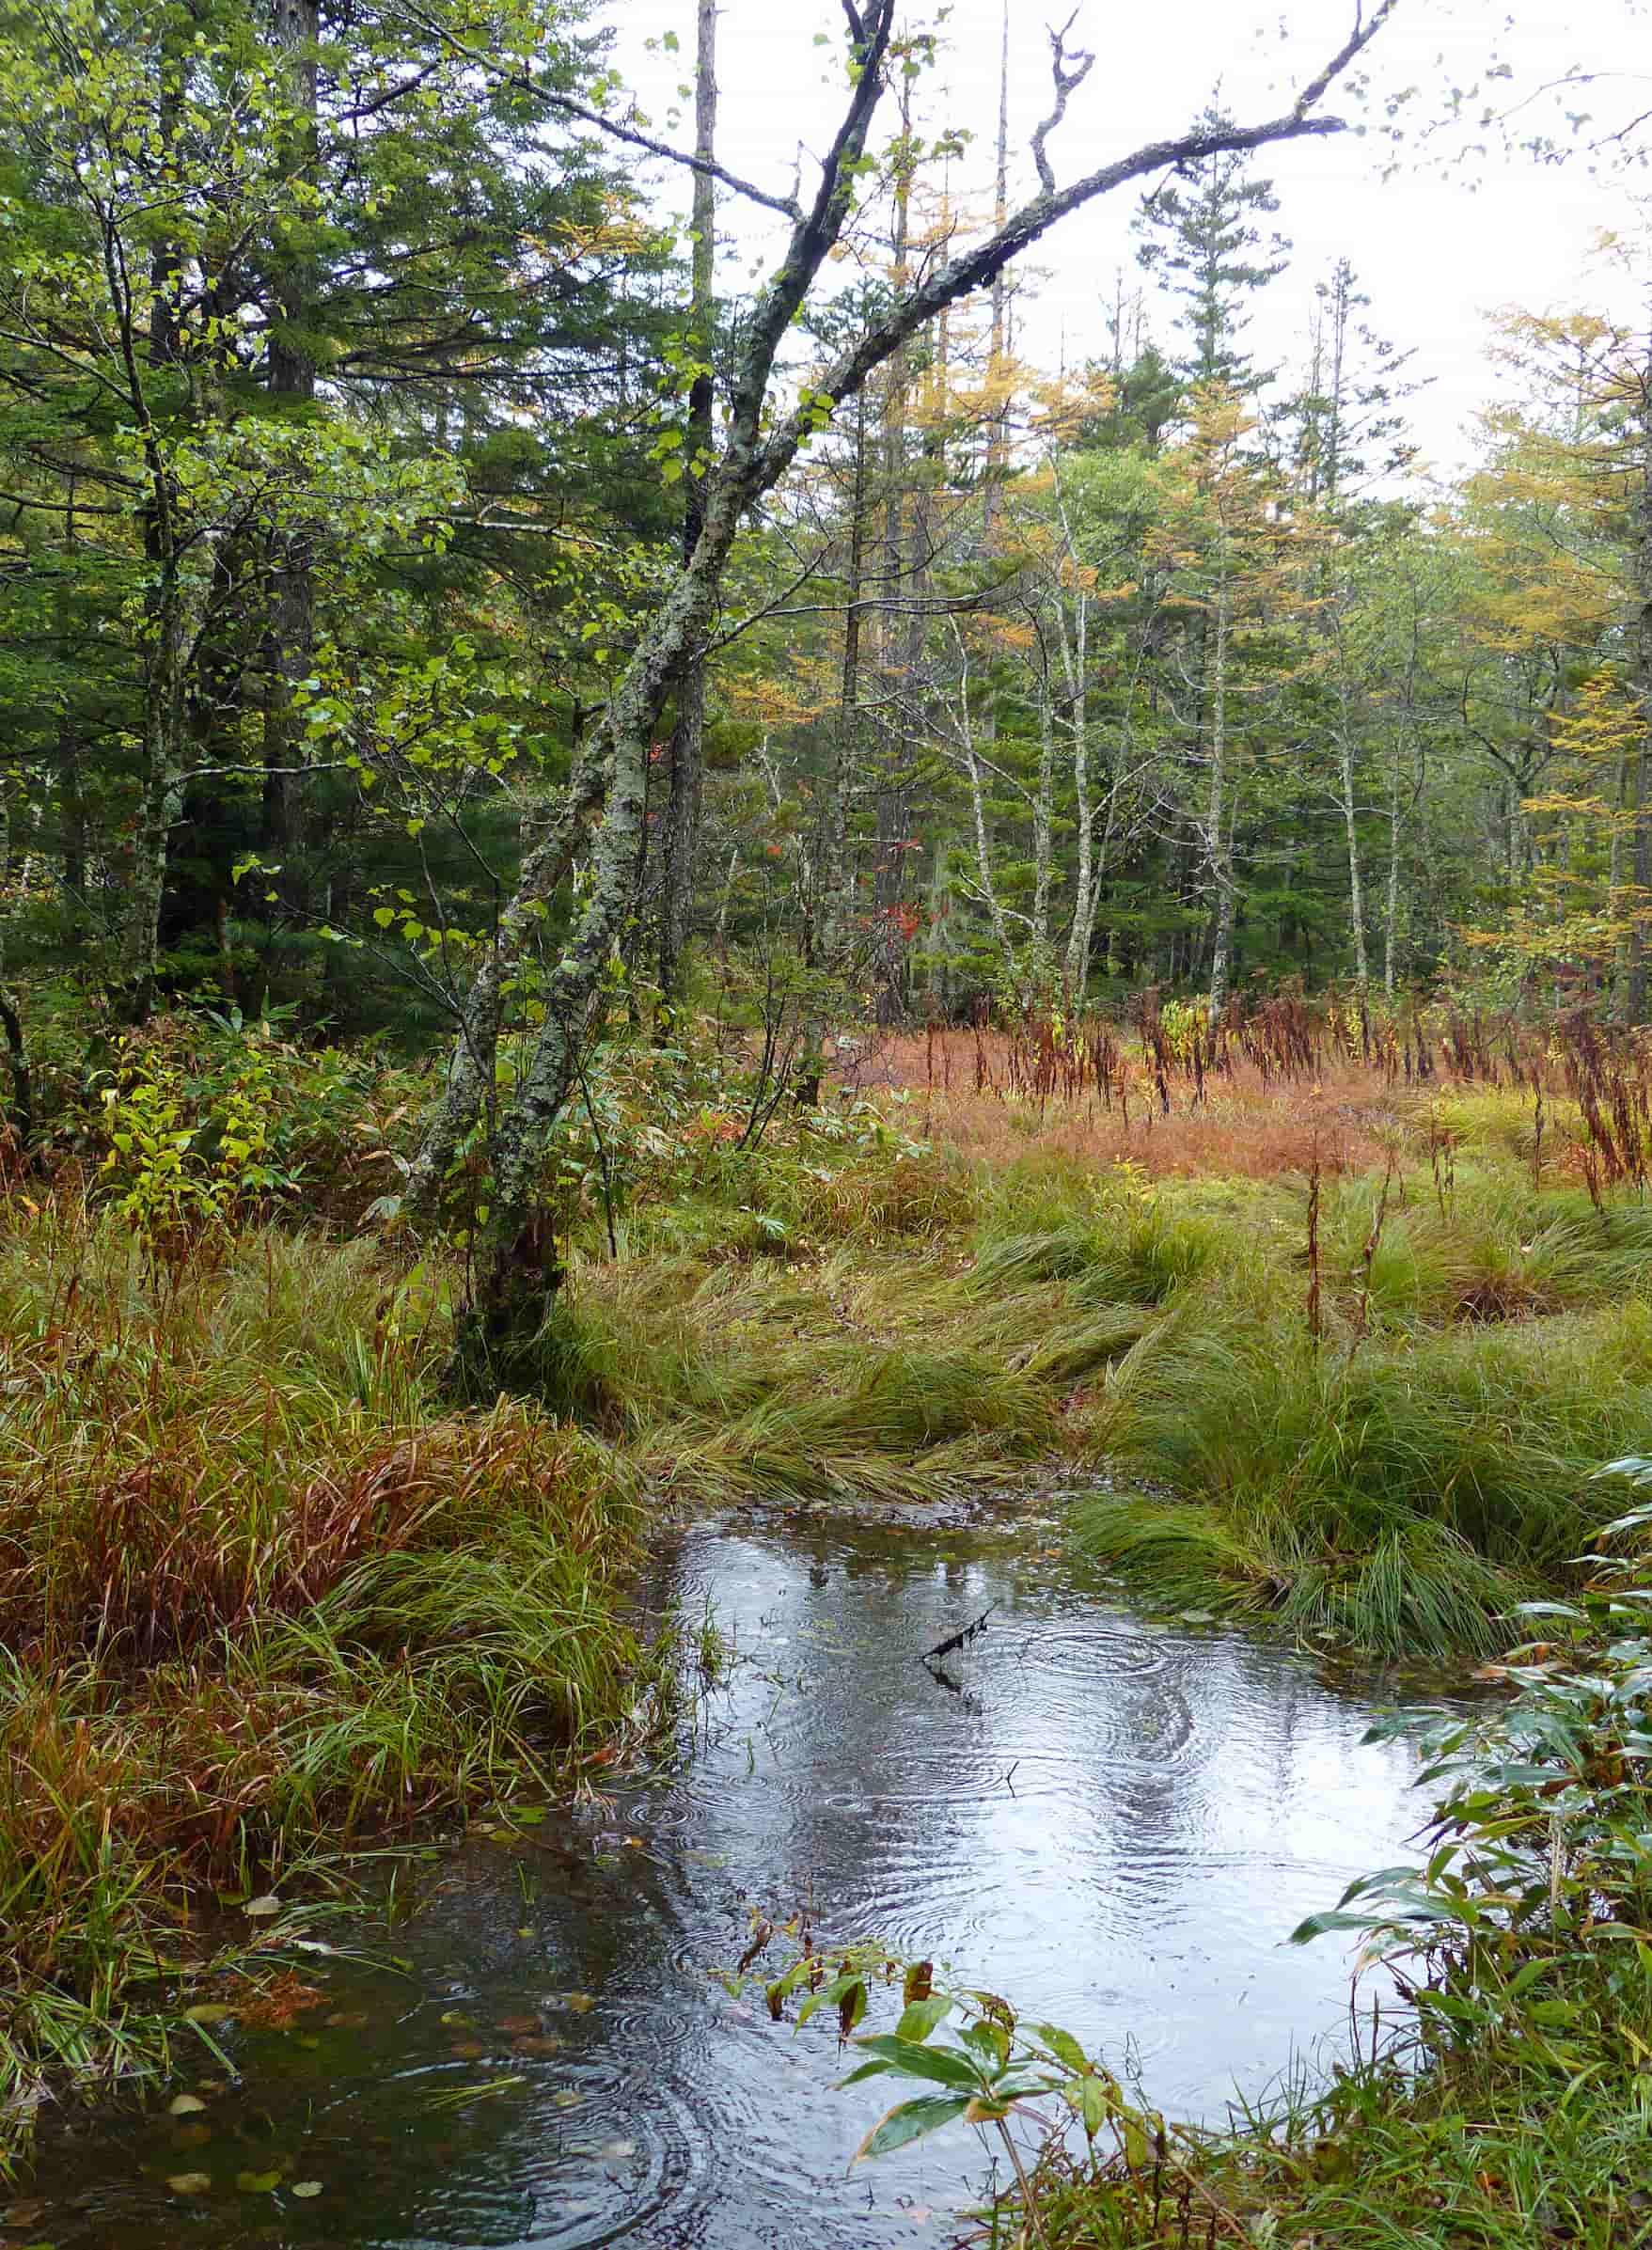 Small stream through a wood